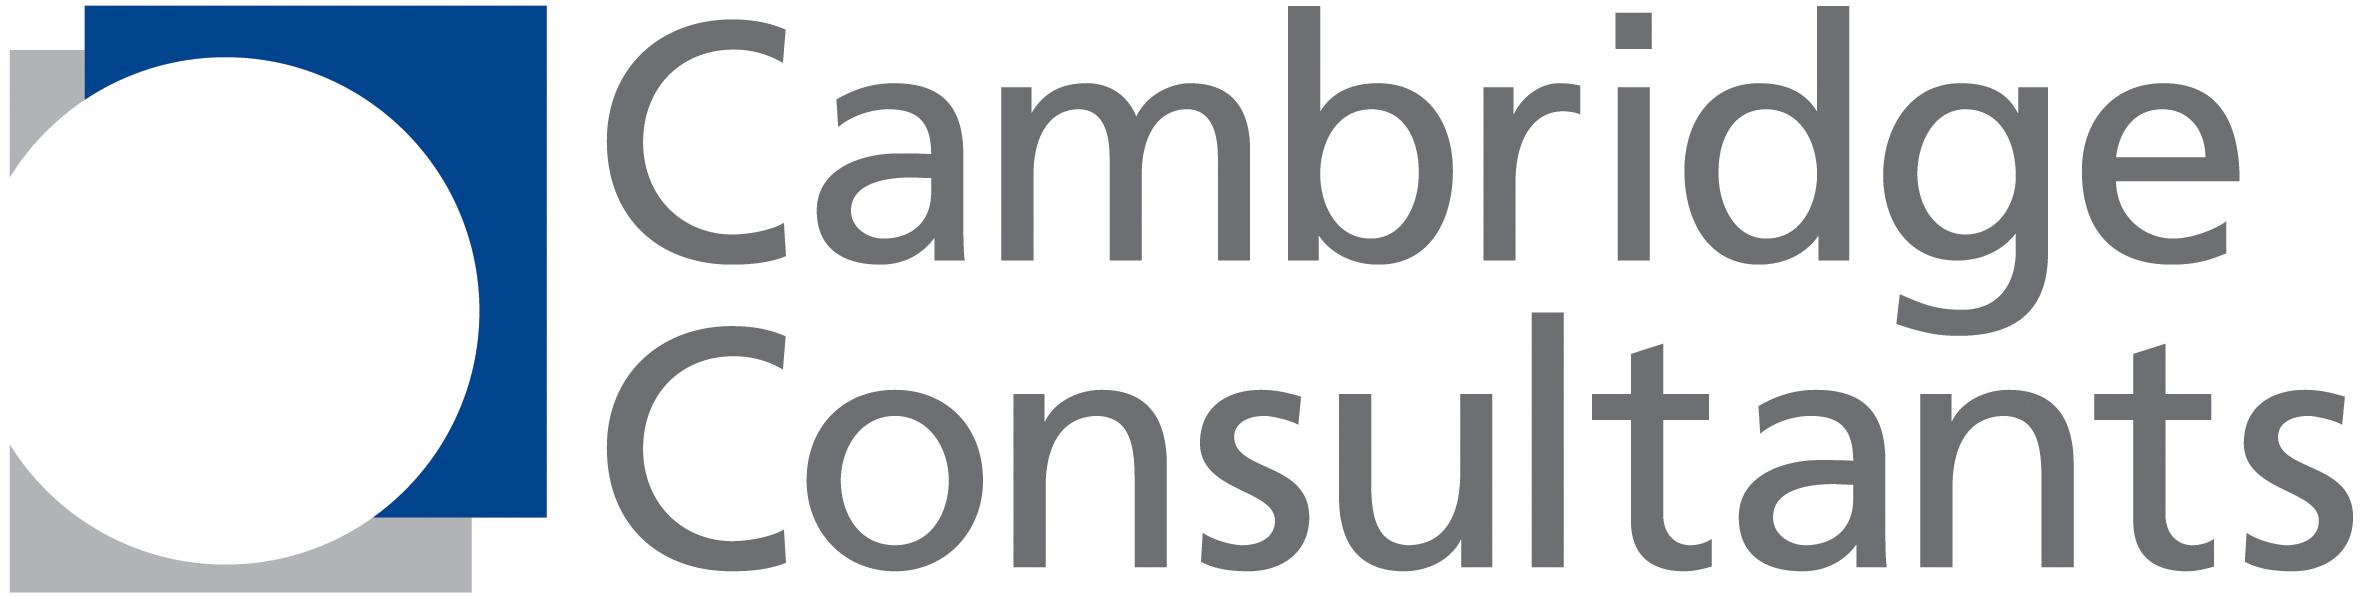 https://www.cambridgeconsultants.com/home